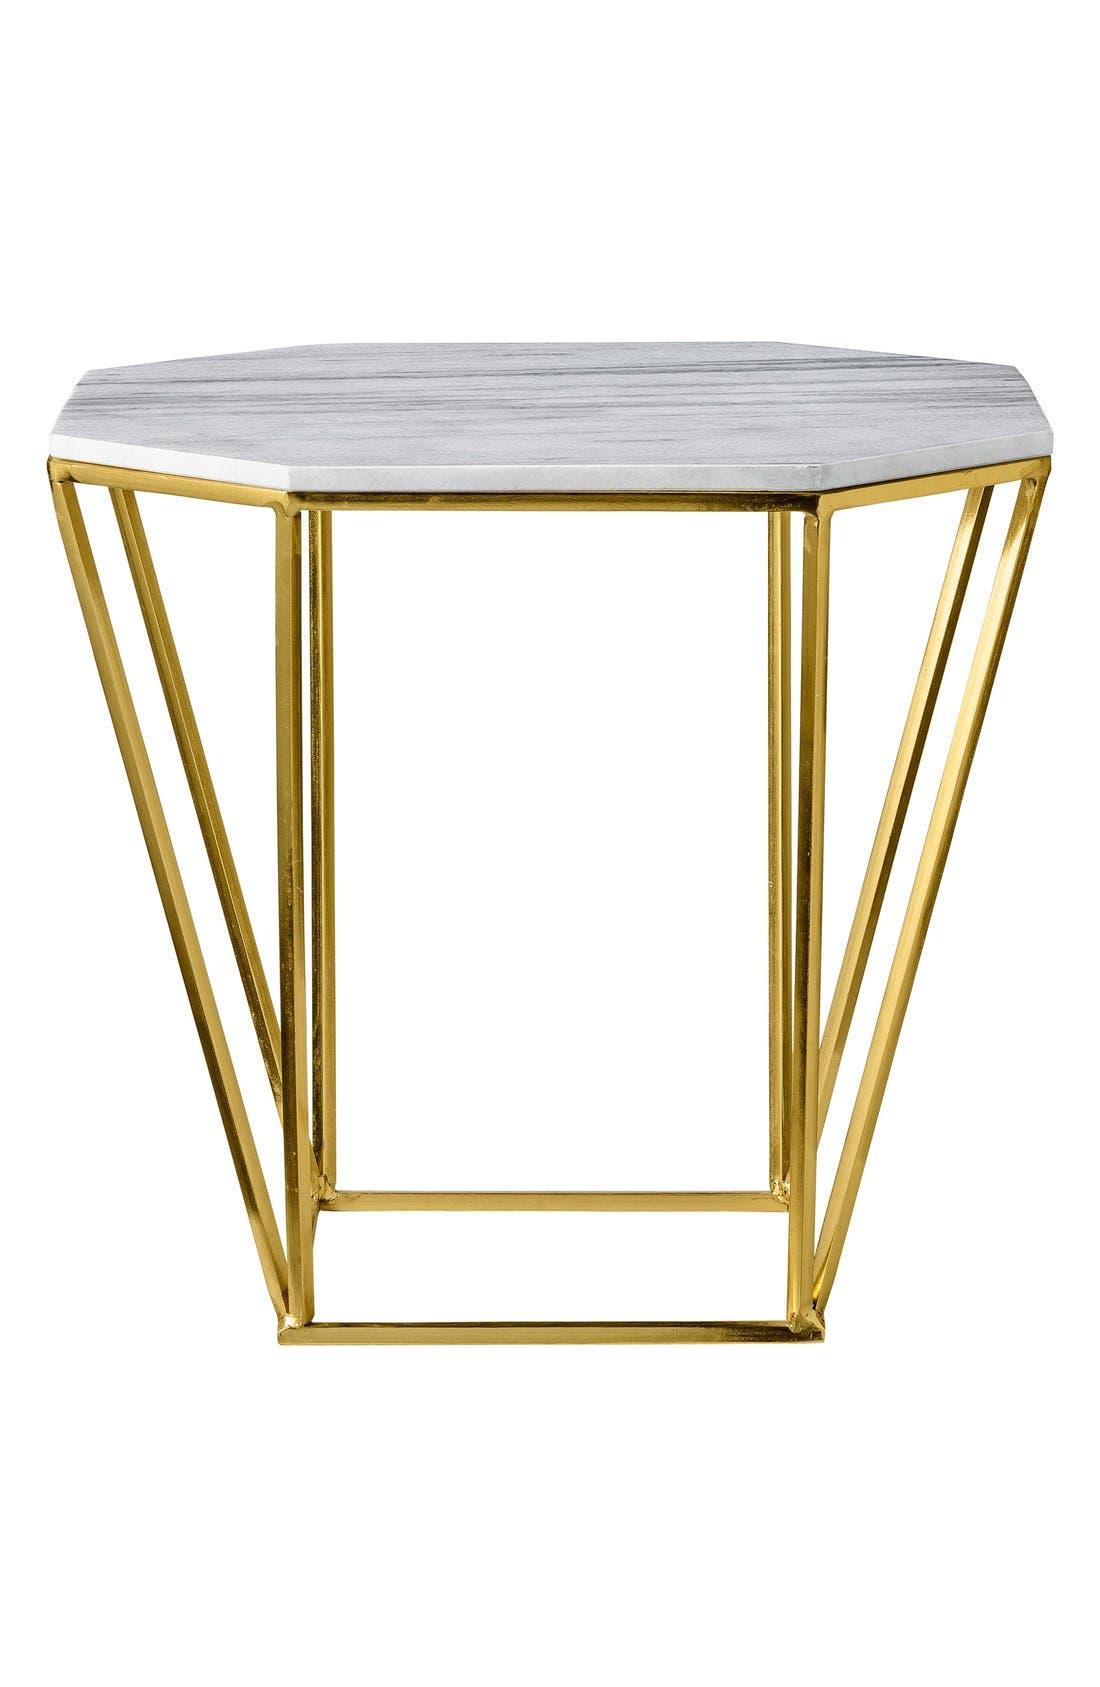 Alternate Image 1 Selected - Bloomingville 'Pentagonal' Accent Table